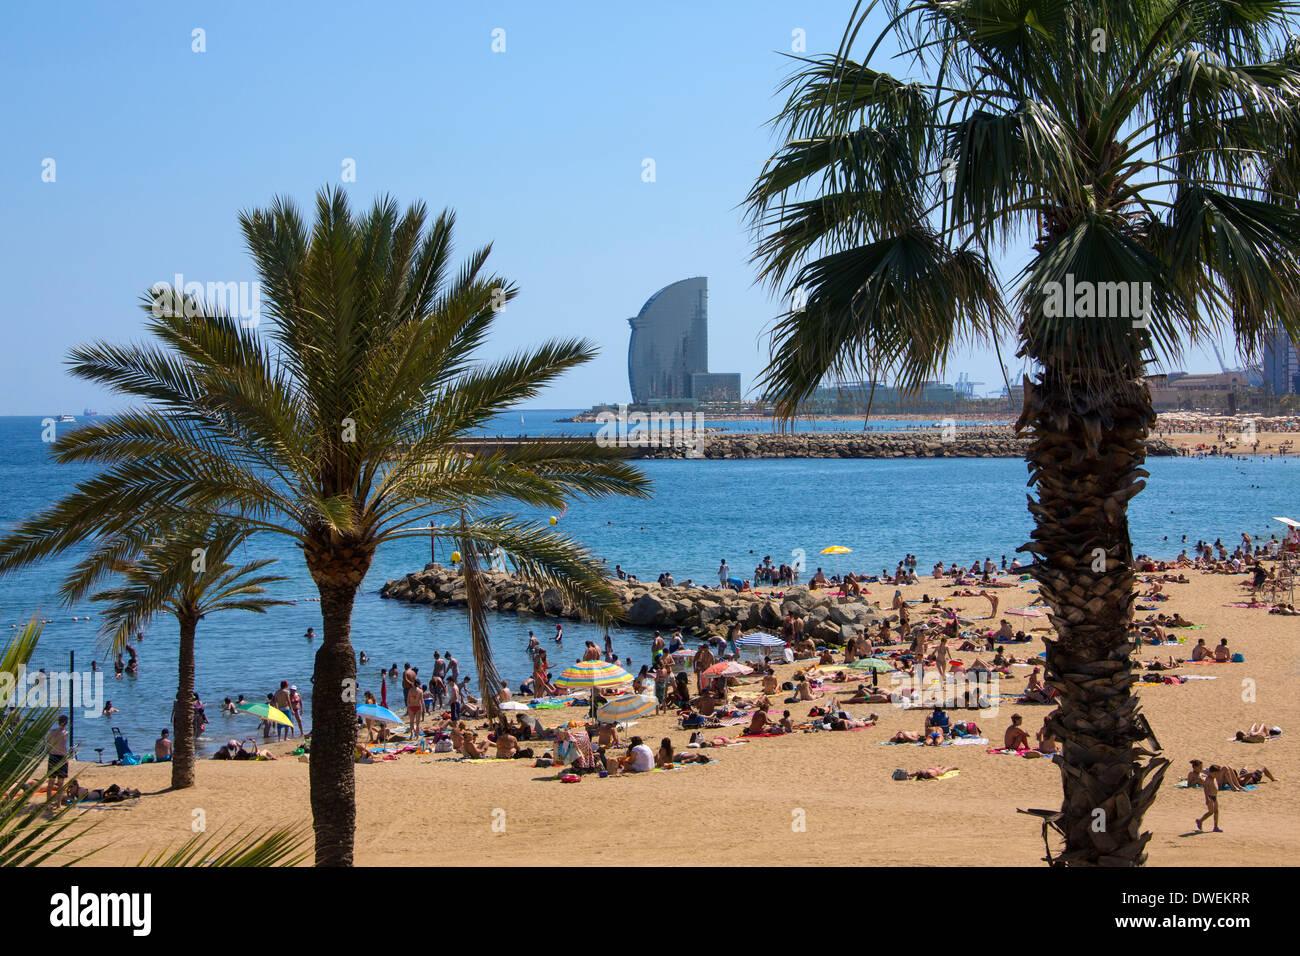 One of Barcelona's beaches (Platja de la Nova Icaria) near Port Olimpic in Barcelona in the Catalonia region of Spain. - Stock Image